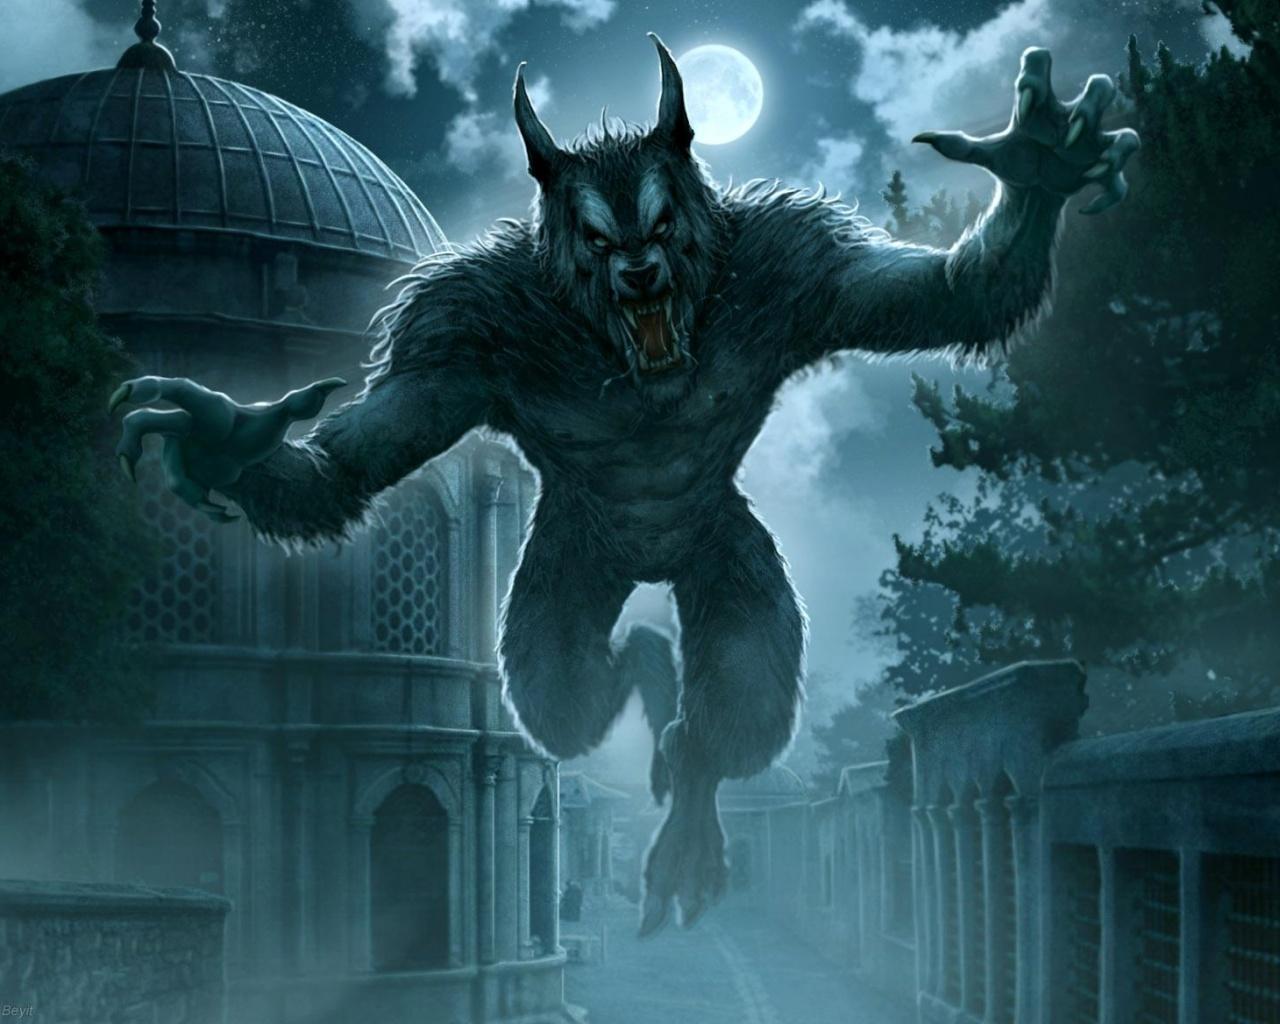 High Resolution Wallpaper | Werewolf 1280x1024 px